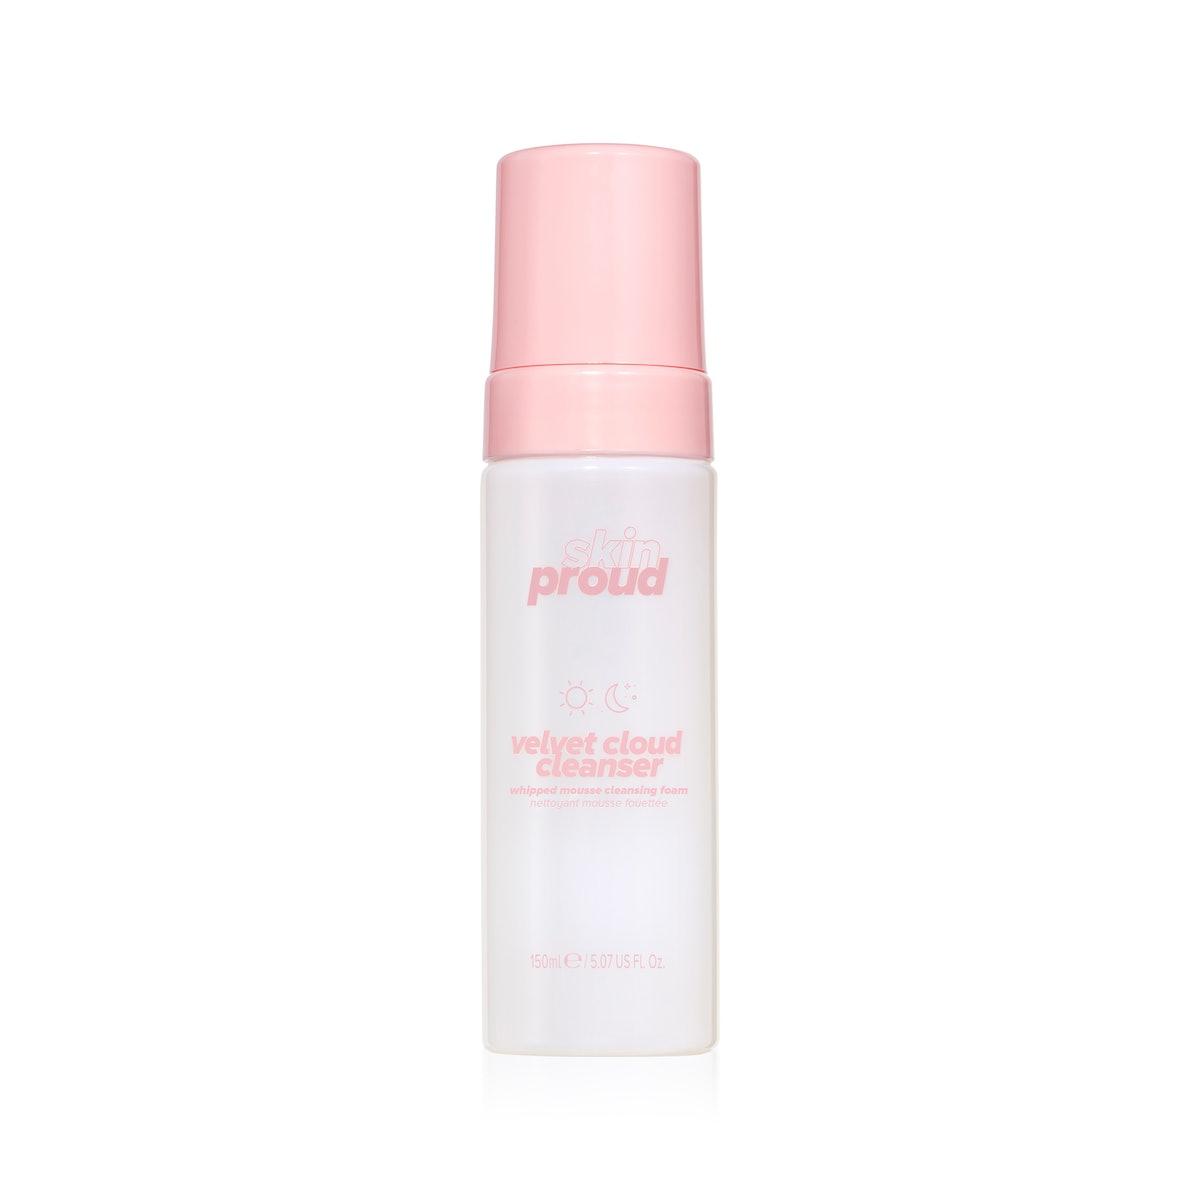 Skin Proud Velvet Cloud, Foaming Facial Cleanser